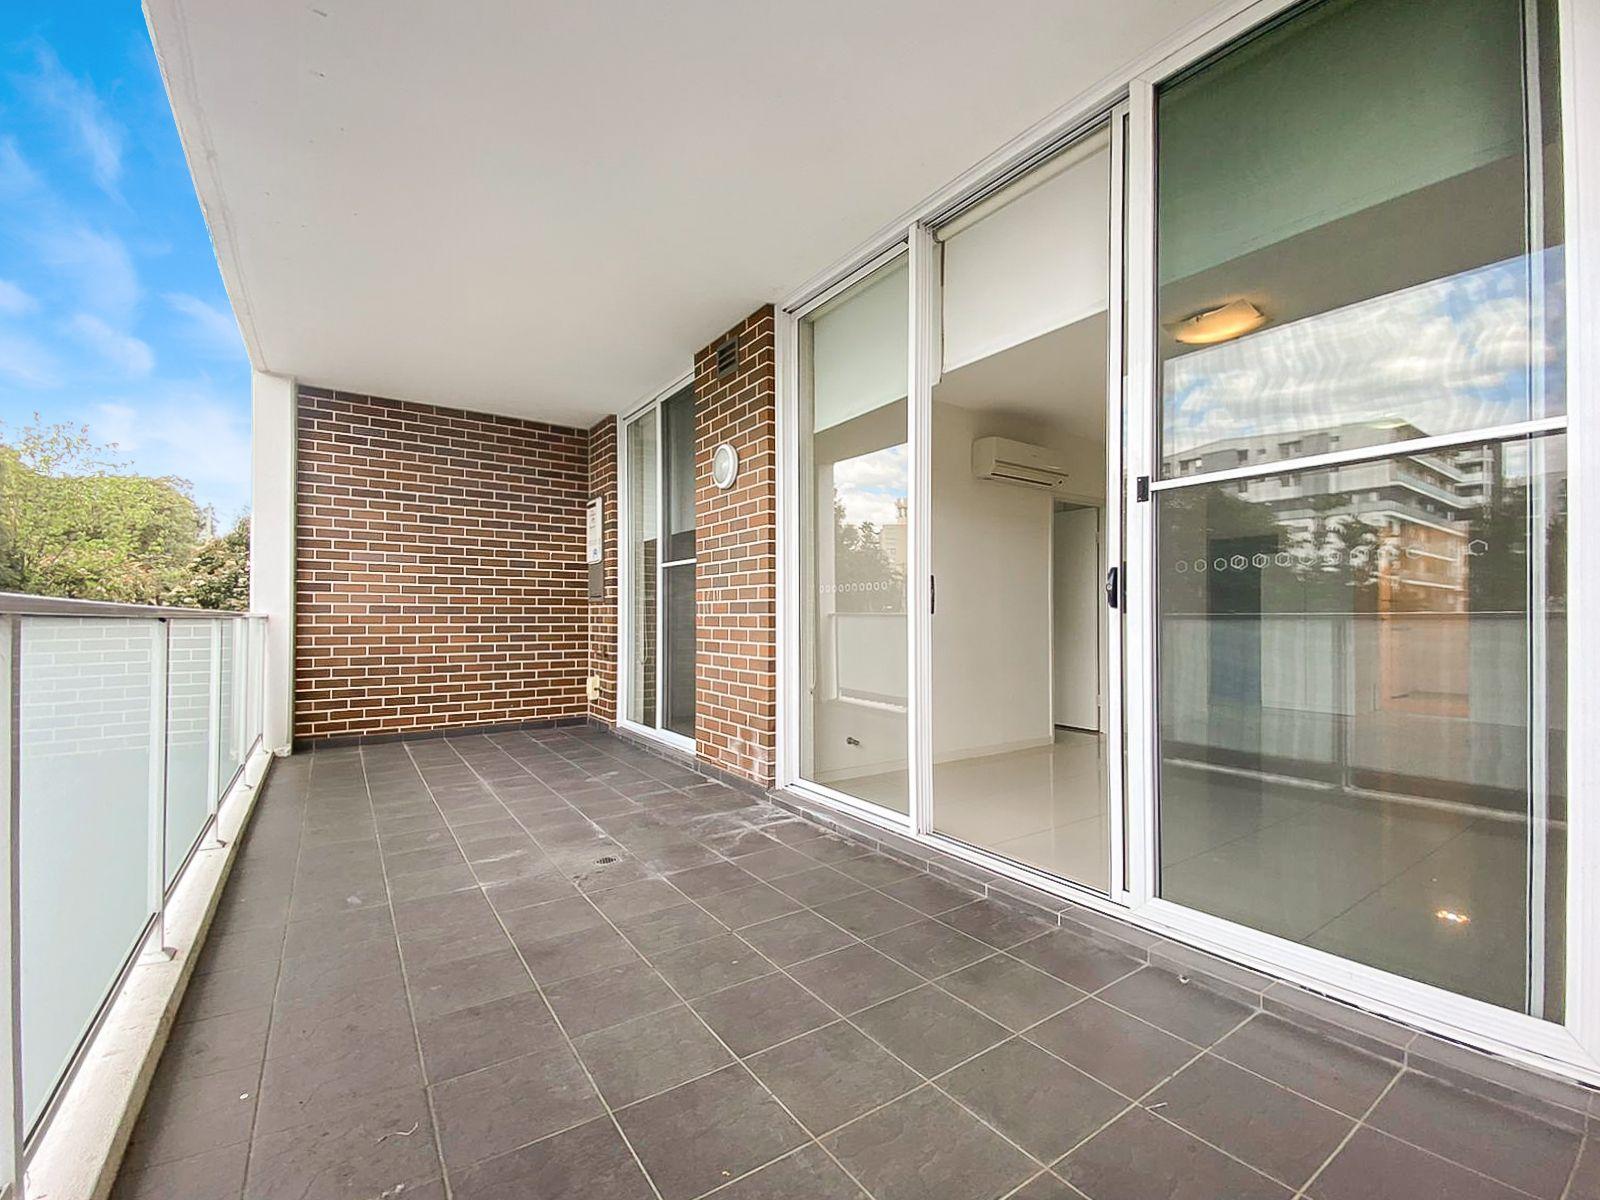 14/91-97 Arthur Street, Rosehill, NSW 2142